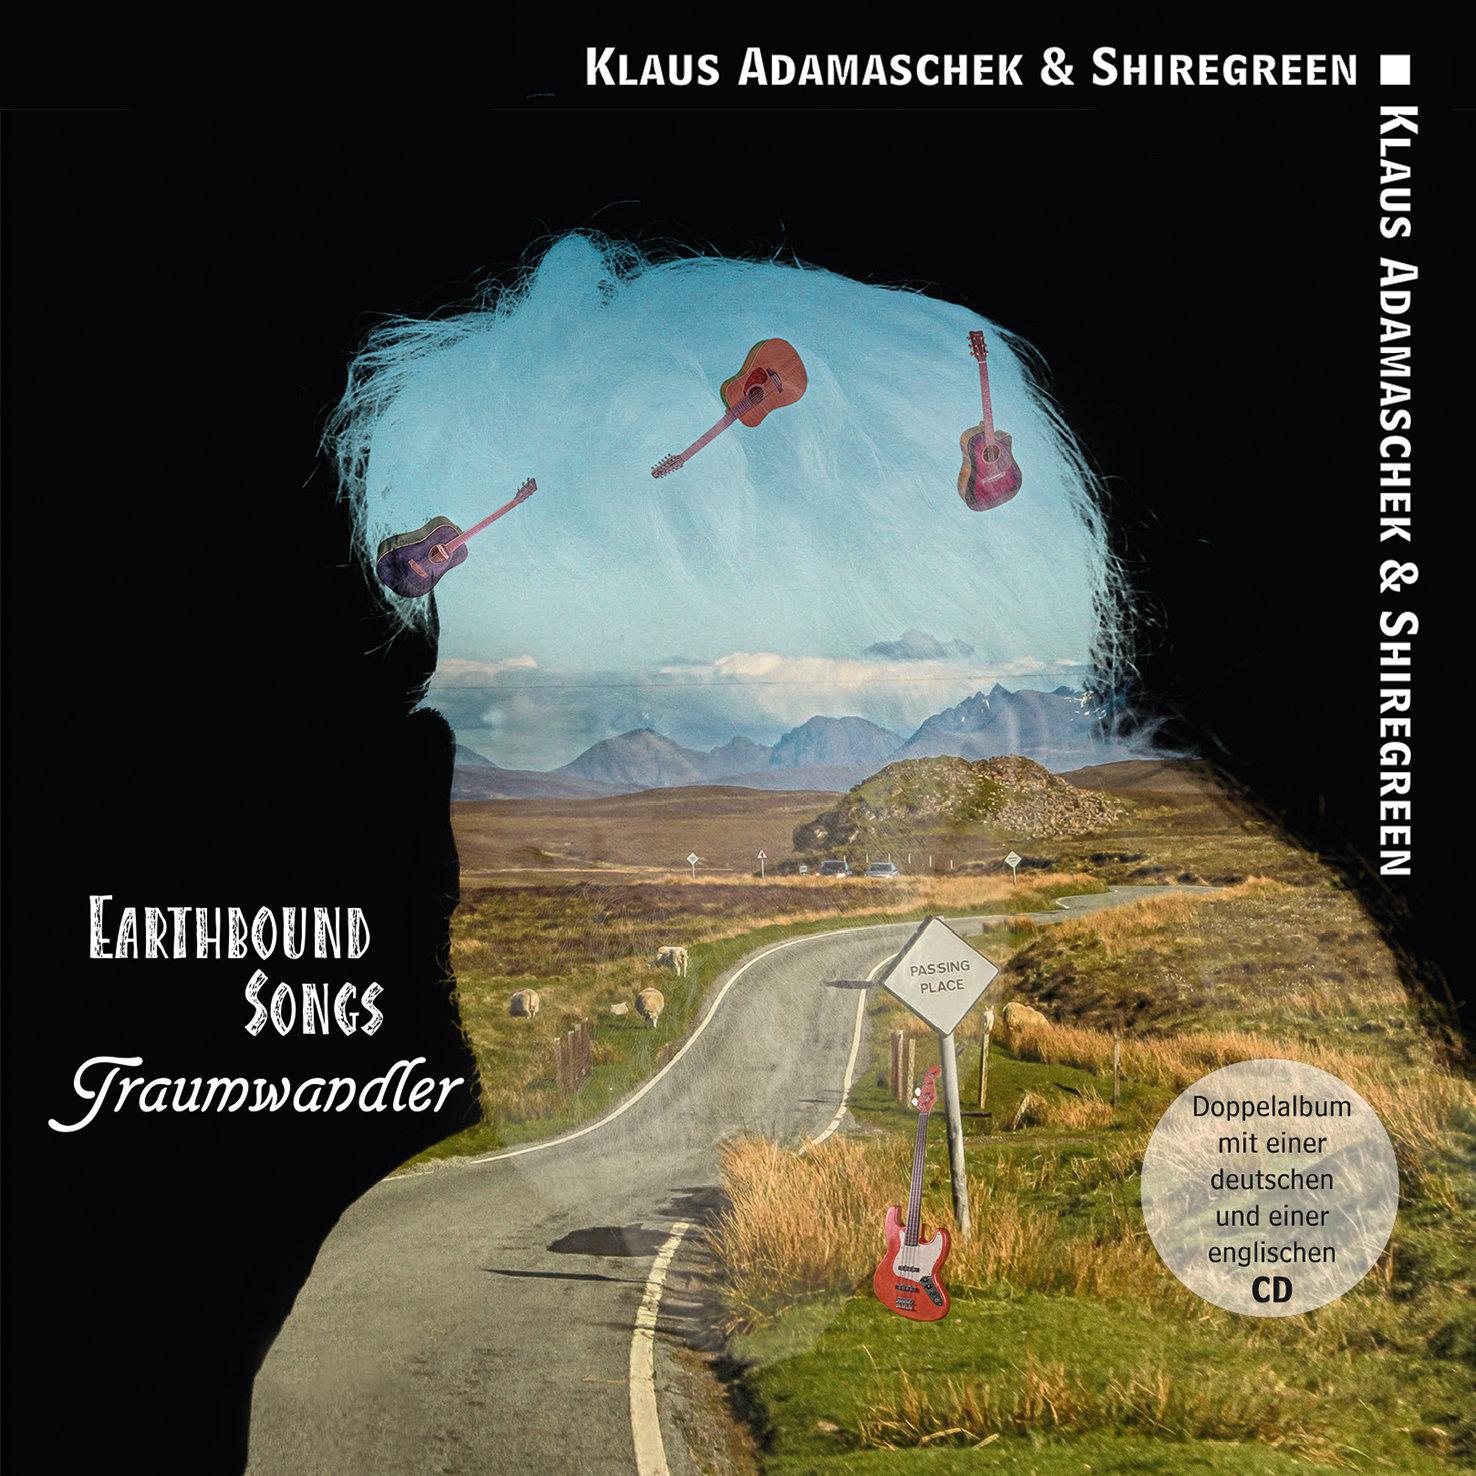 Shiregreen_Klaus Adamaschek_Traumwandler_Earthbound songs release